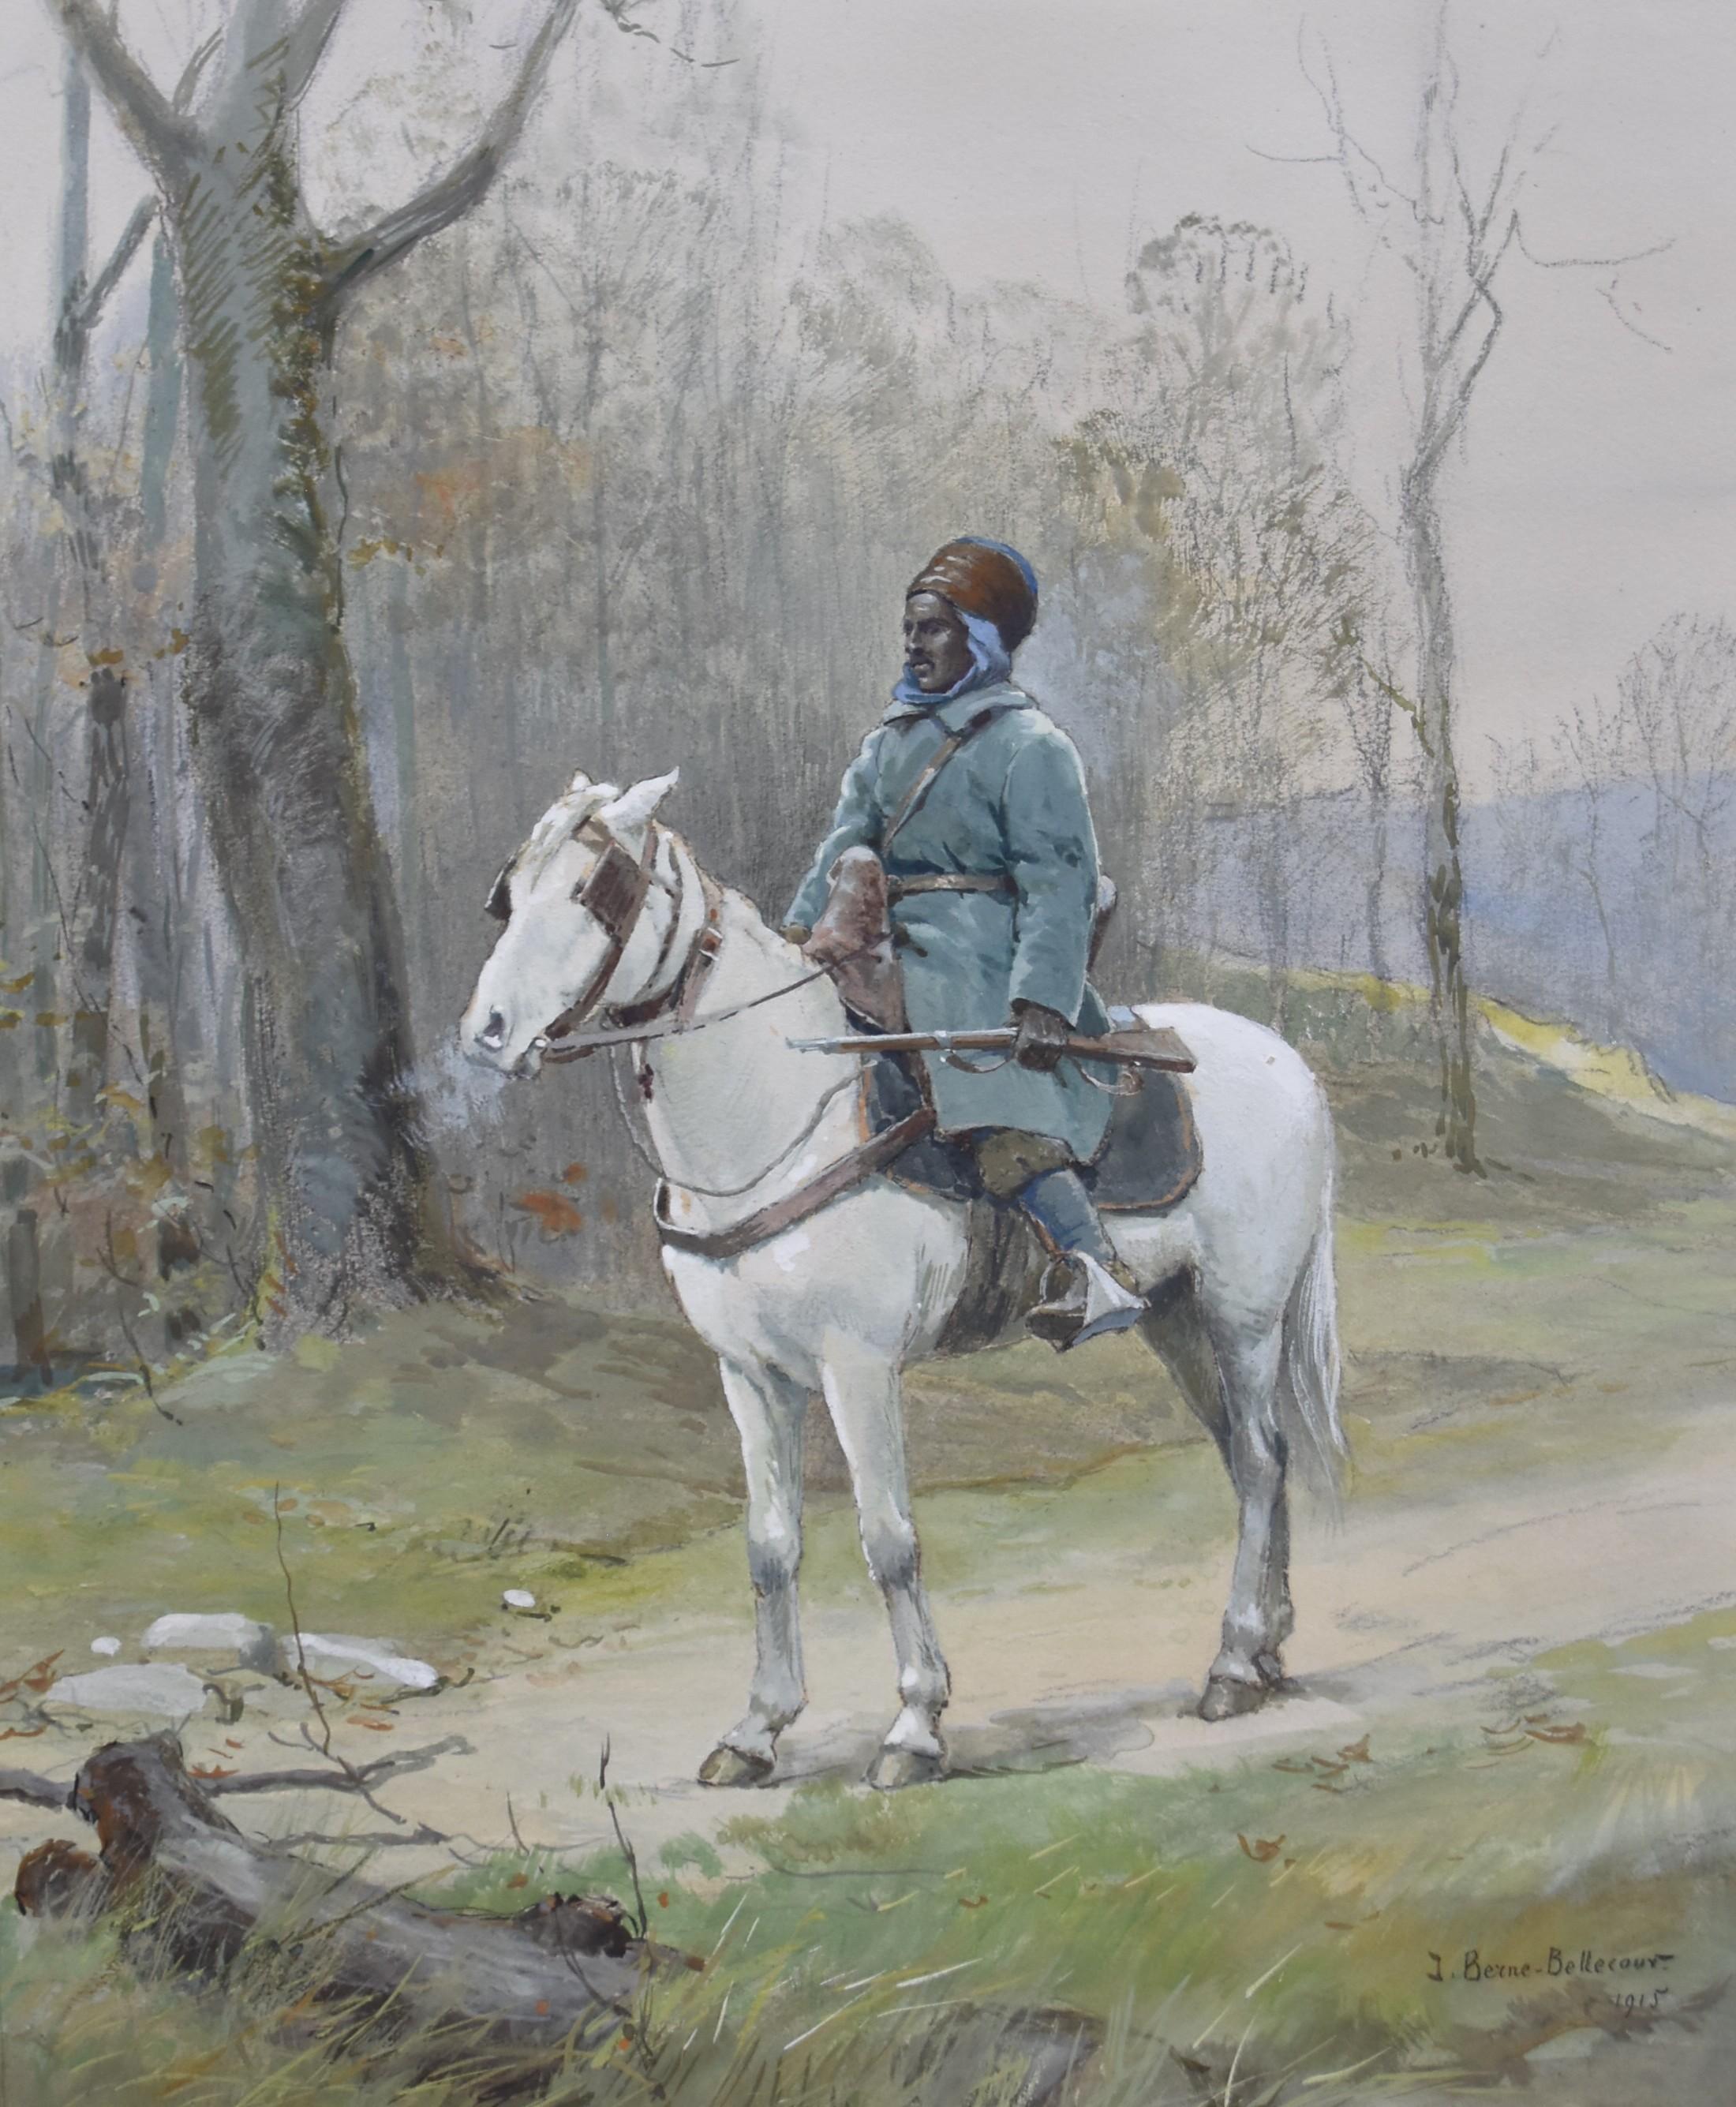 J.Jacques Berne-Bellecour (1874-1939), North African Horseman, 1915, watercolor